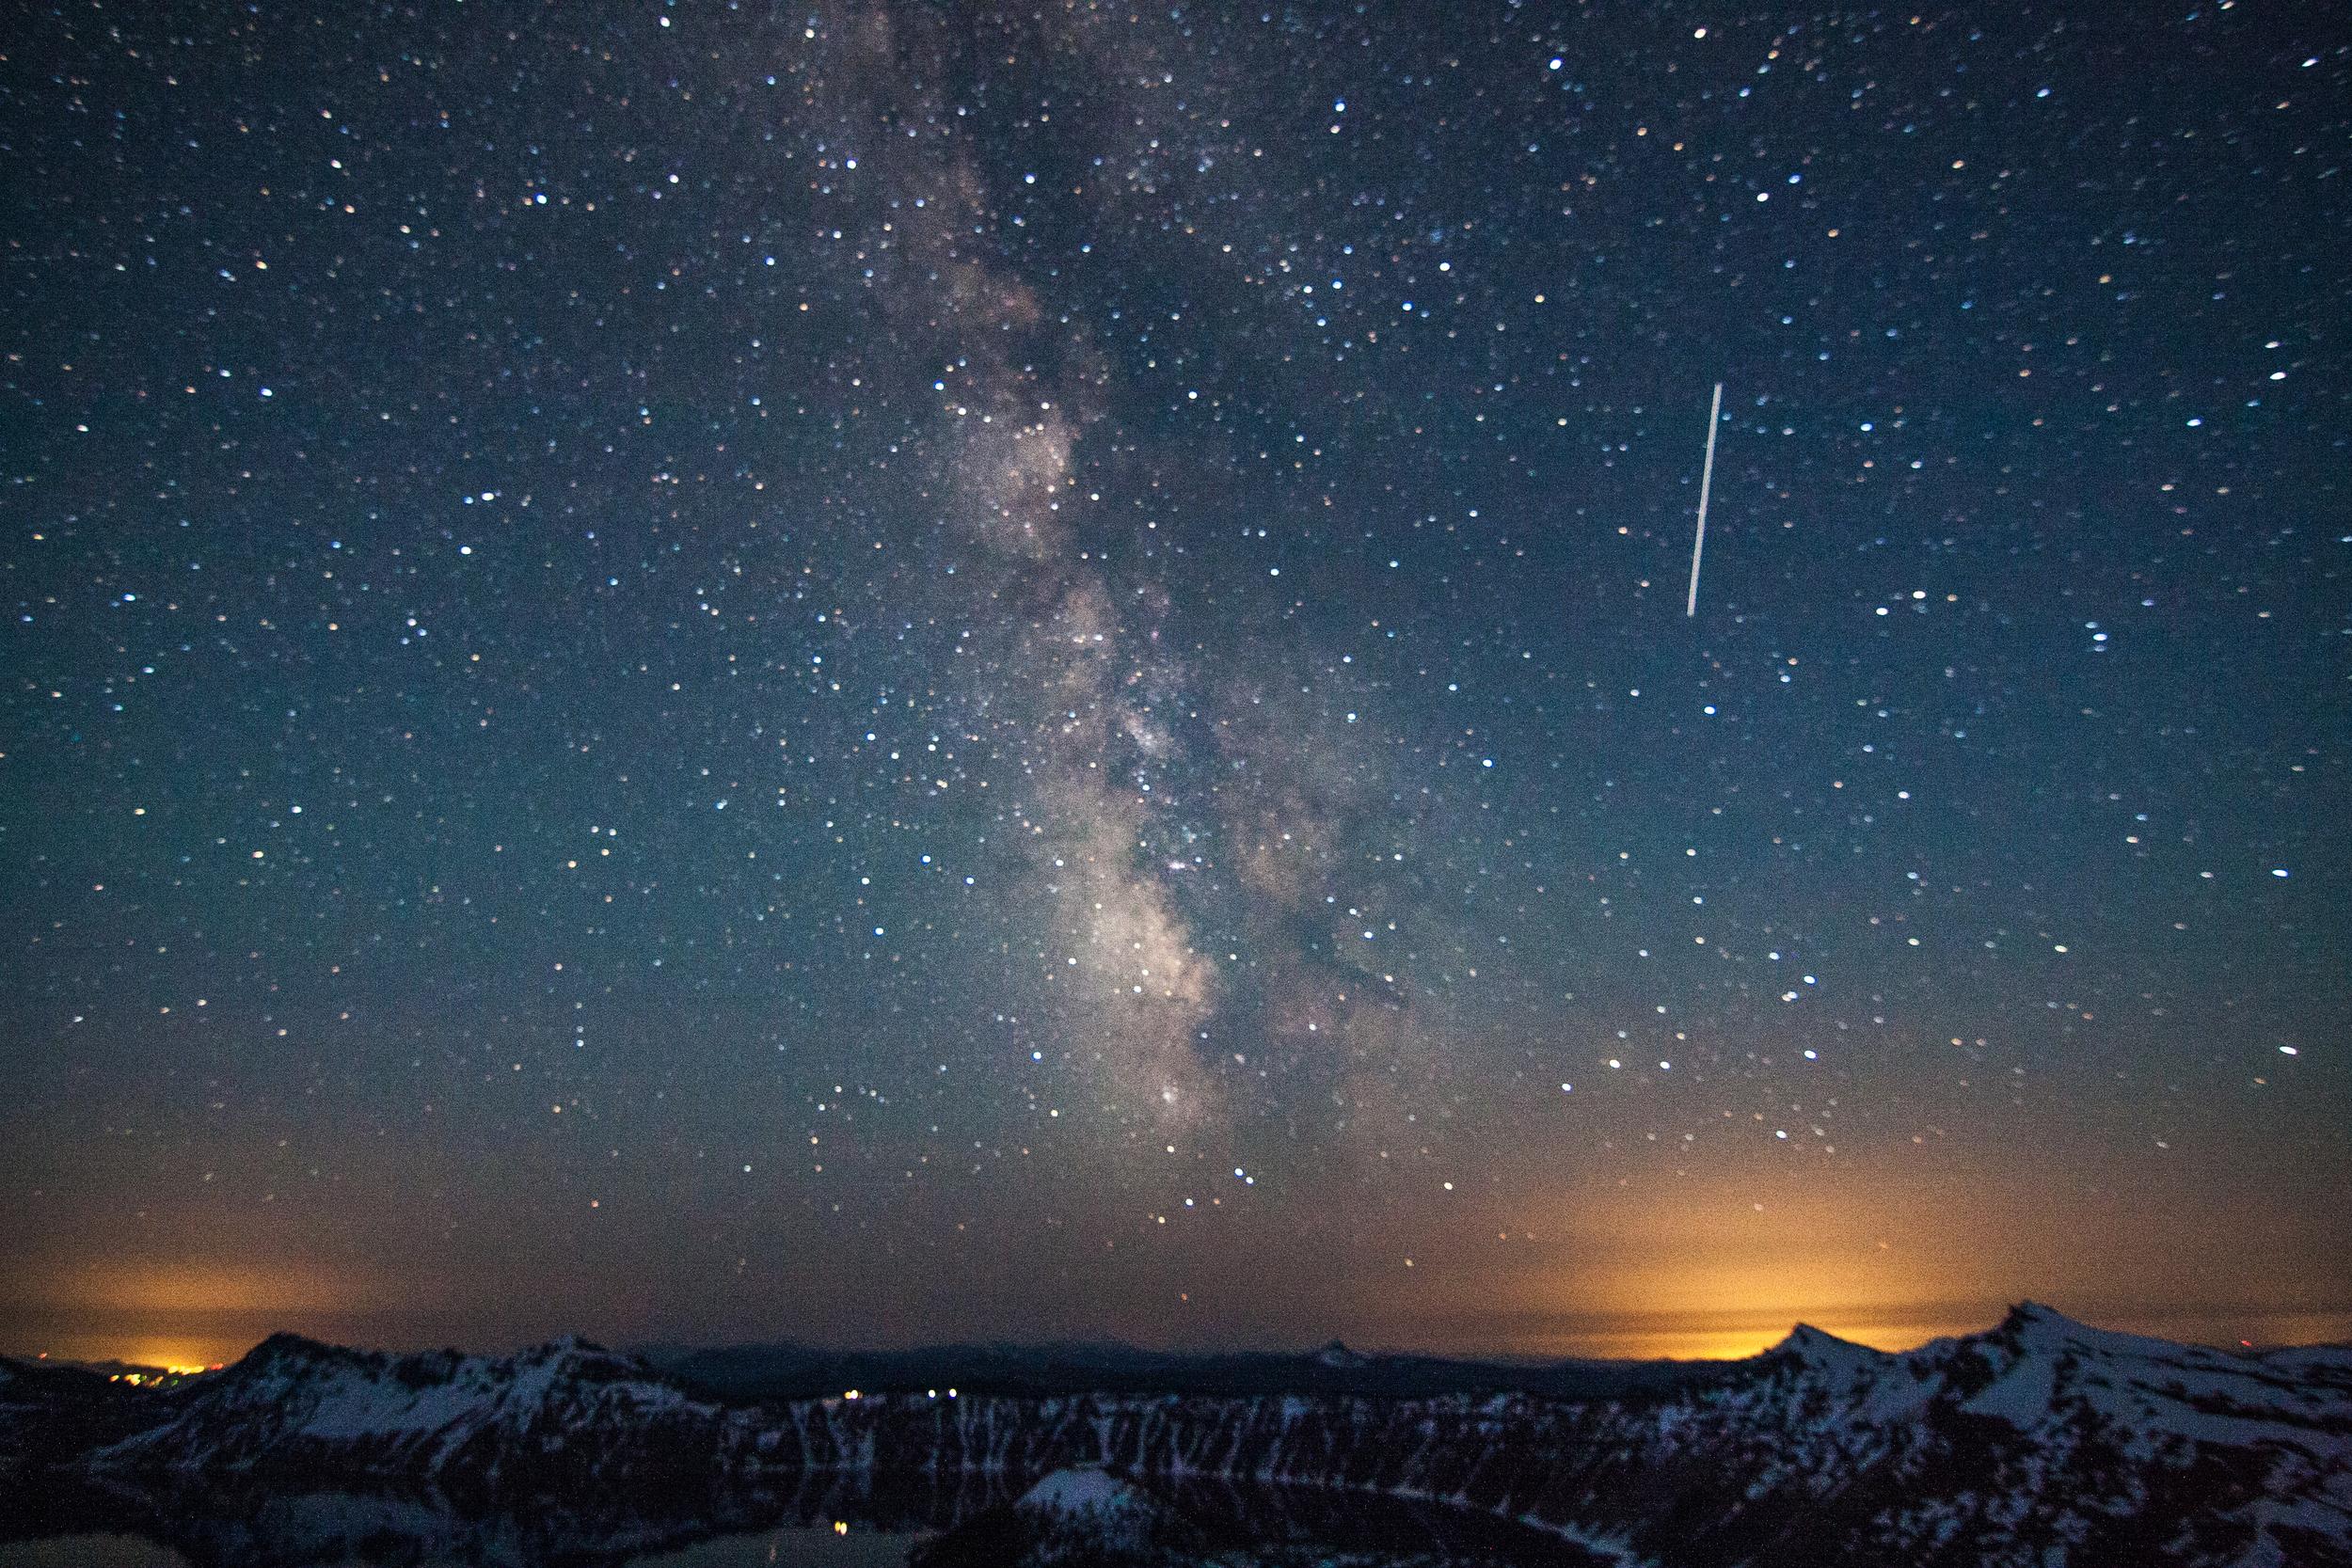 International Space Station over Crater Lake, Oregon, 2014.